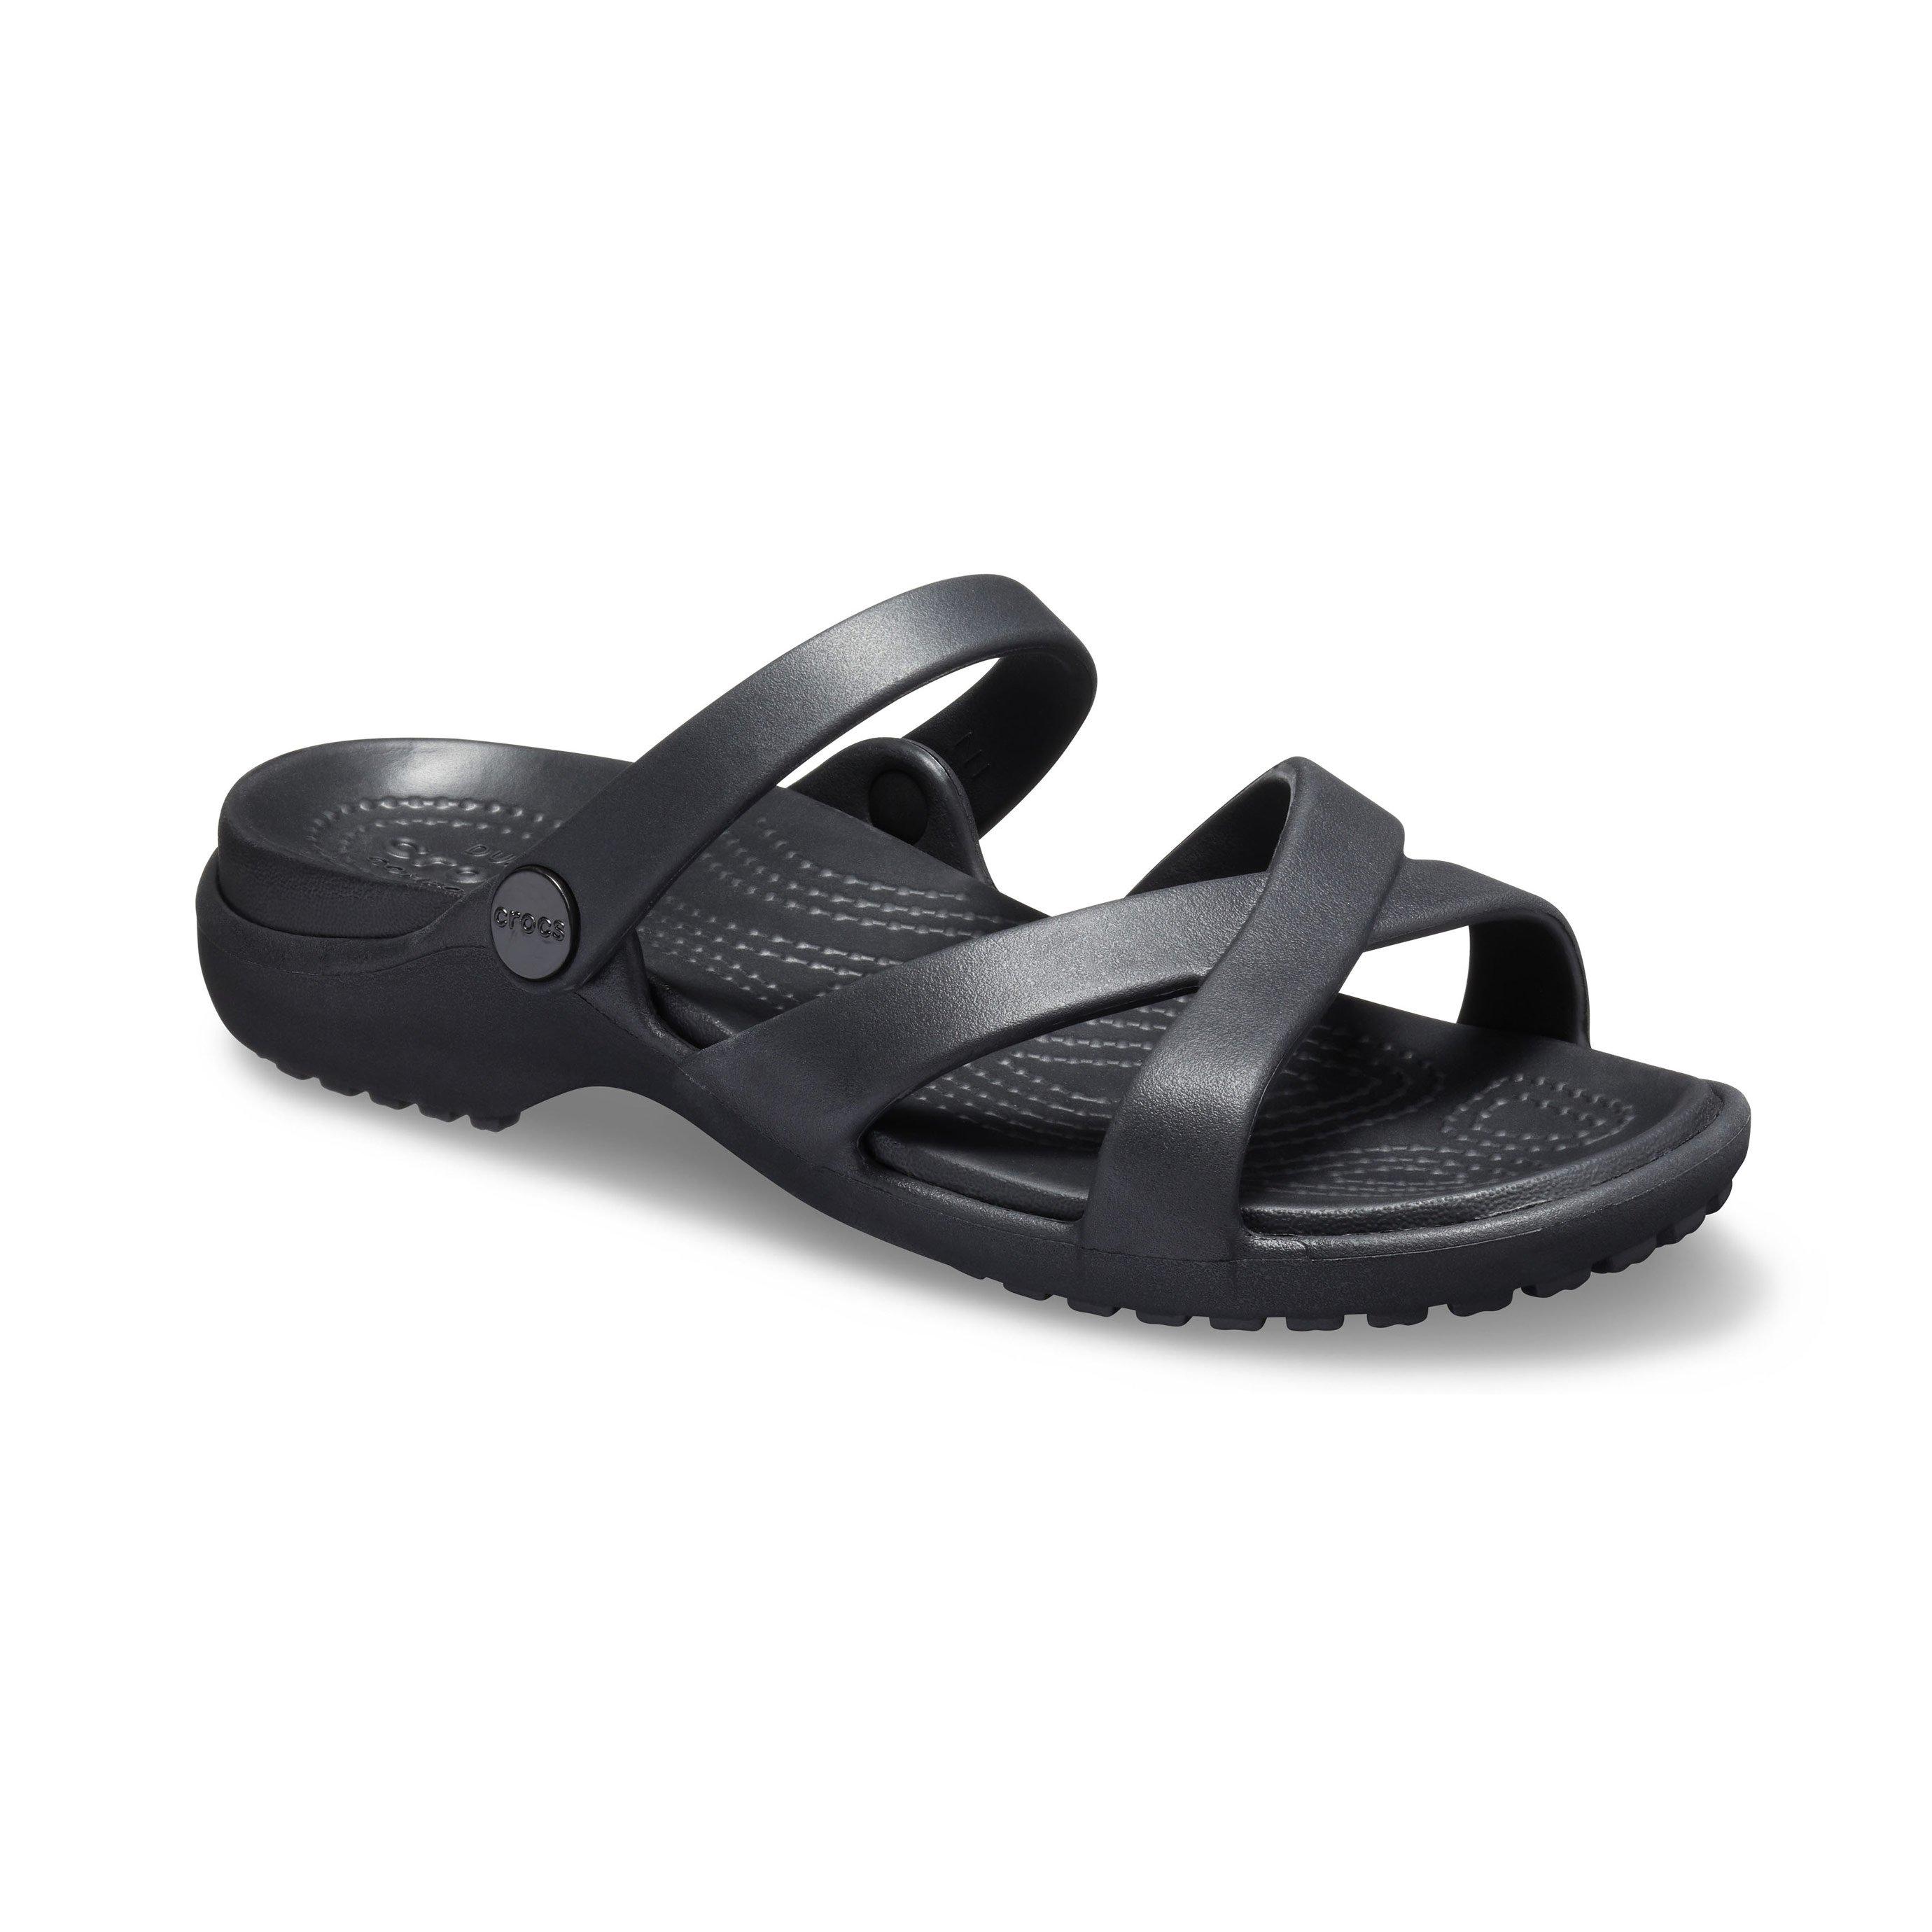 Crocs Meleen - כפכף קלאסי שחור עם רצועות מוצלבות